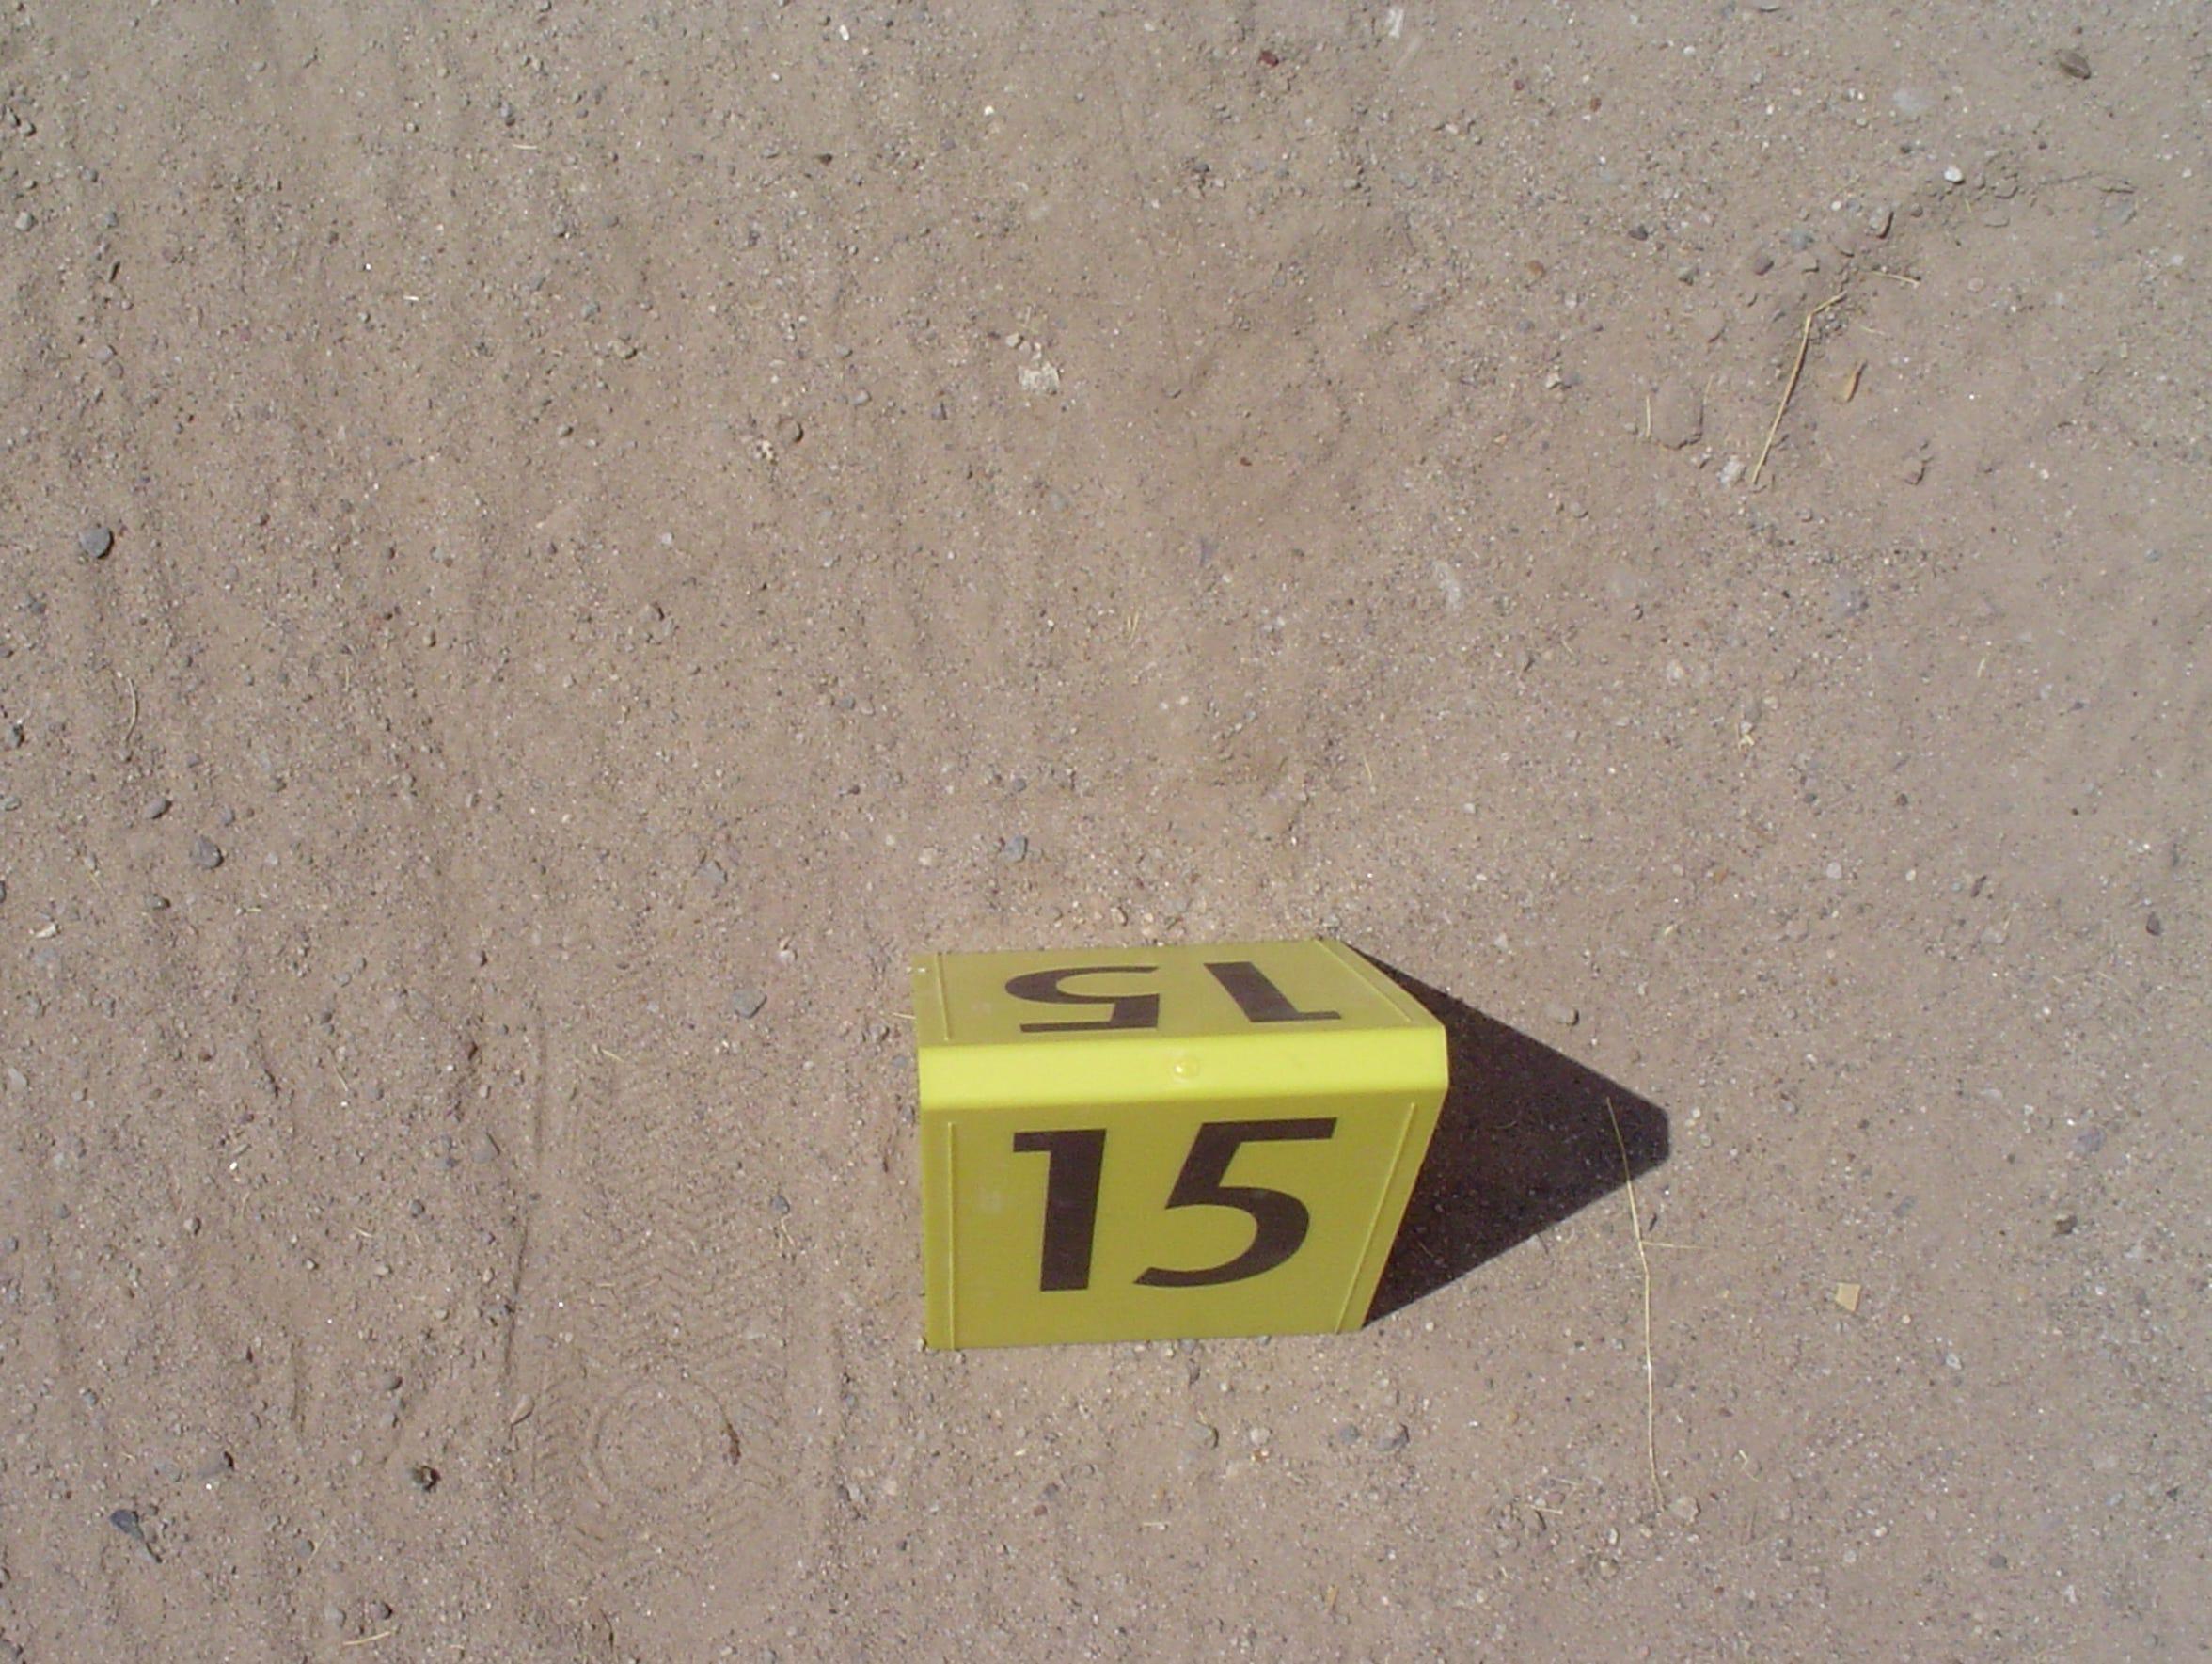 Footprints were found near where the getaway car --